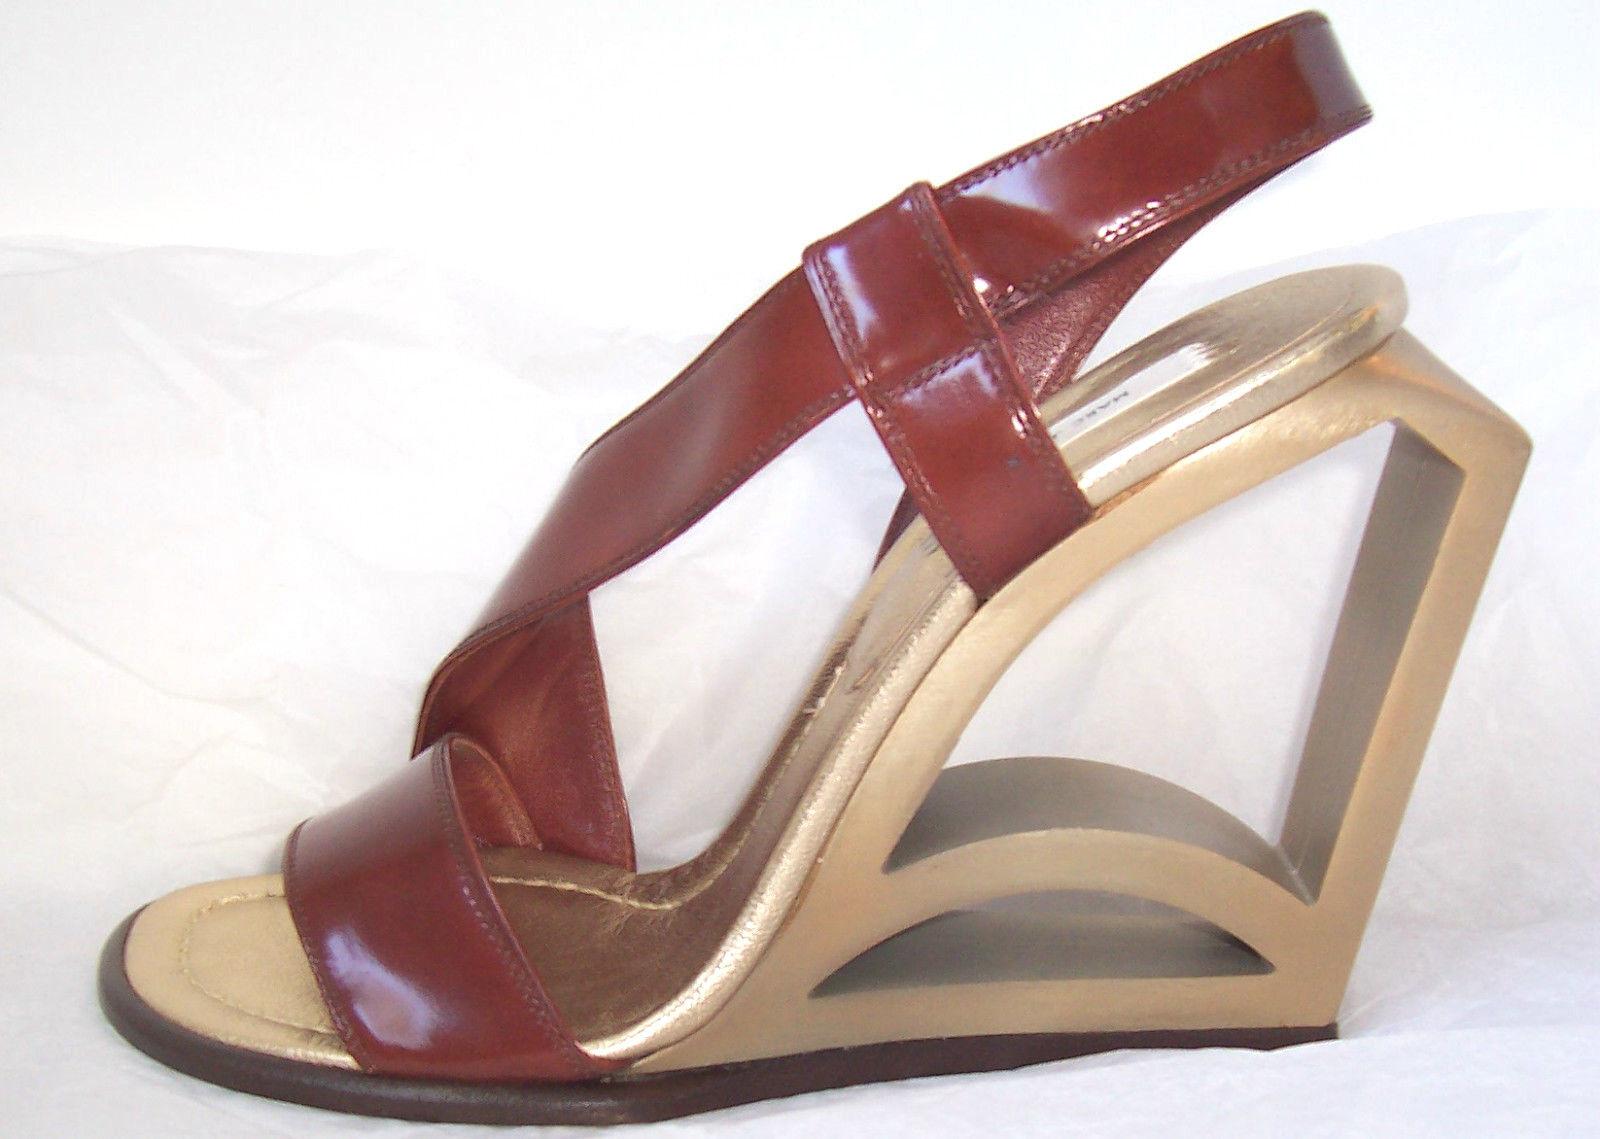 MARC JACOBS bspringaaa läder guld Cut Out Out Out Wedge Sandals skor 39.5  kunder först